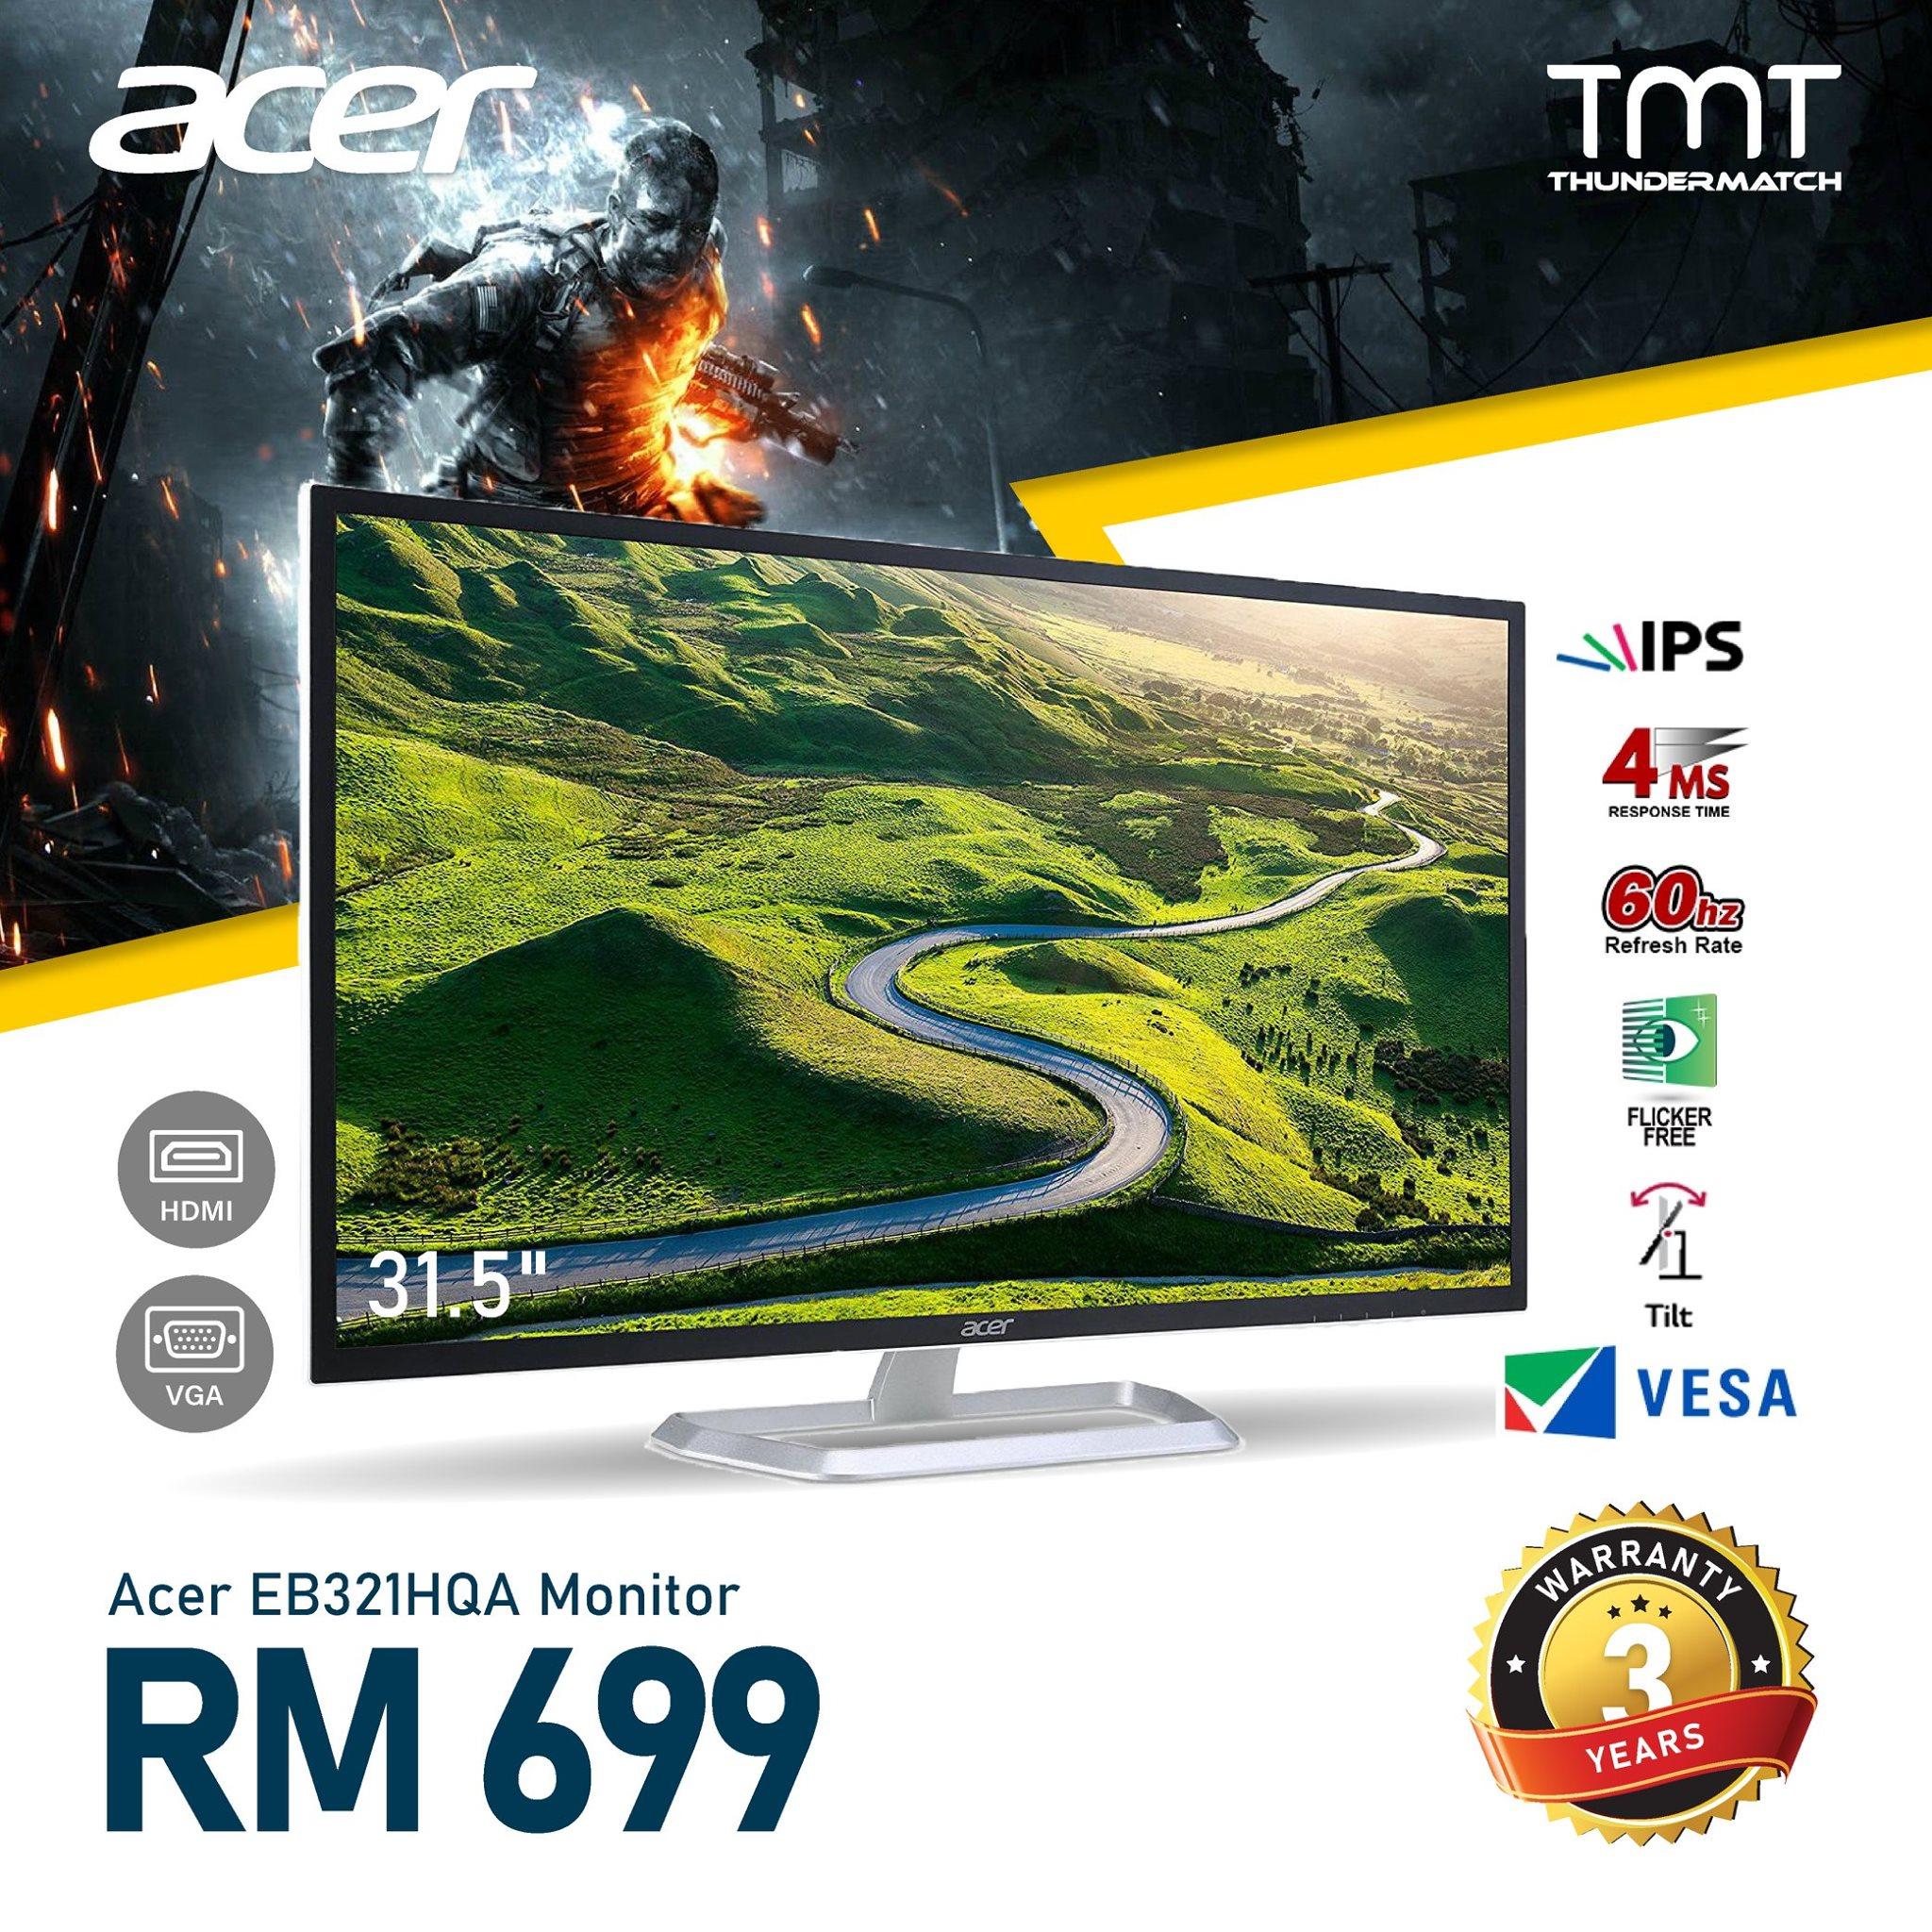 Acer EB321HQA